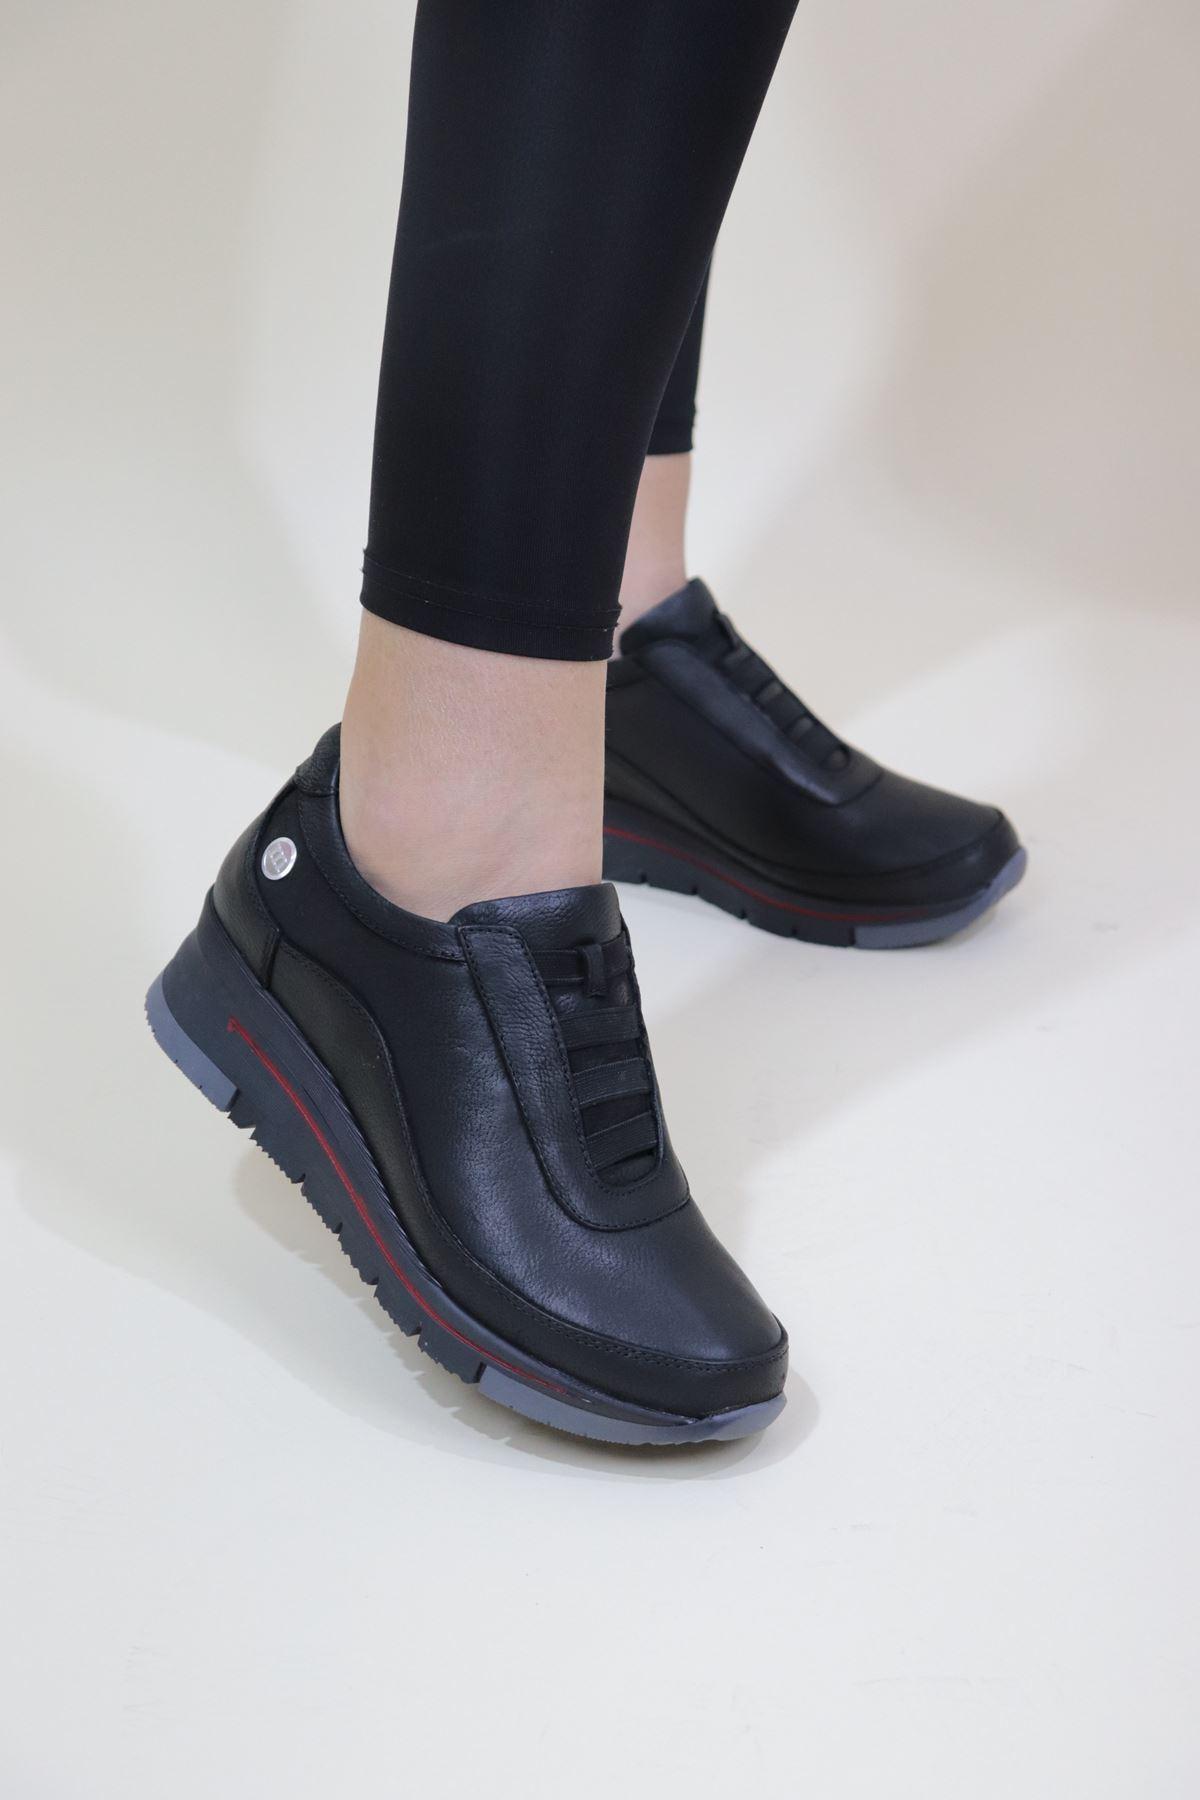 Mammamia - D20KA-275-B Siyah Dolgu Kadın Ayakkabısı